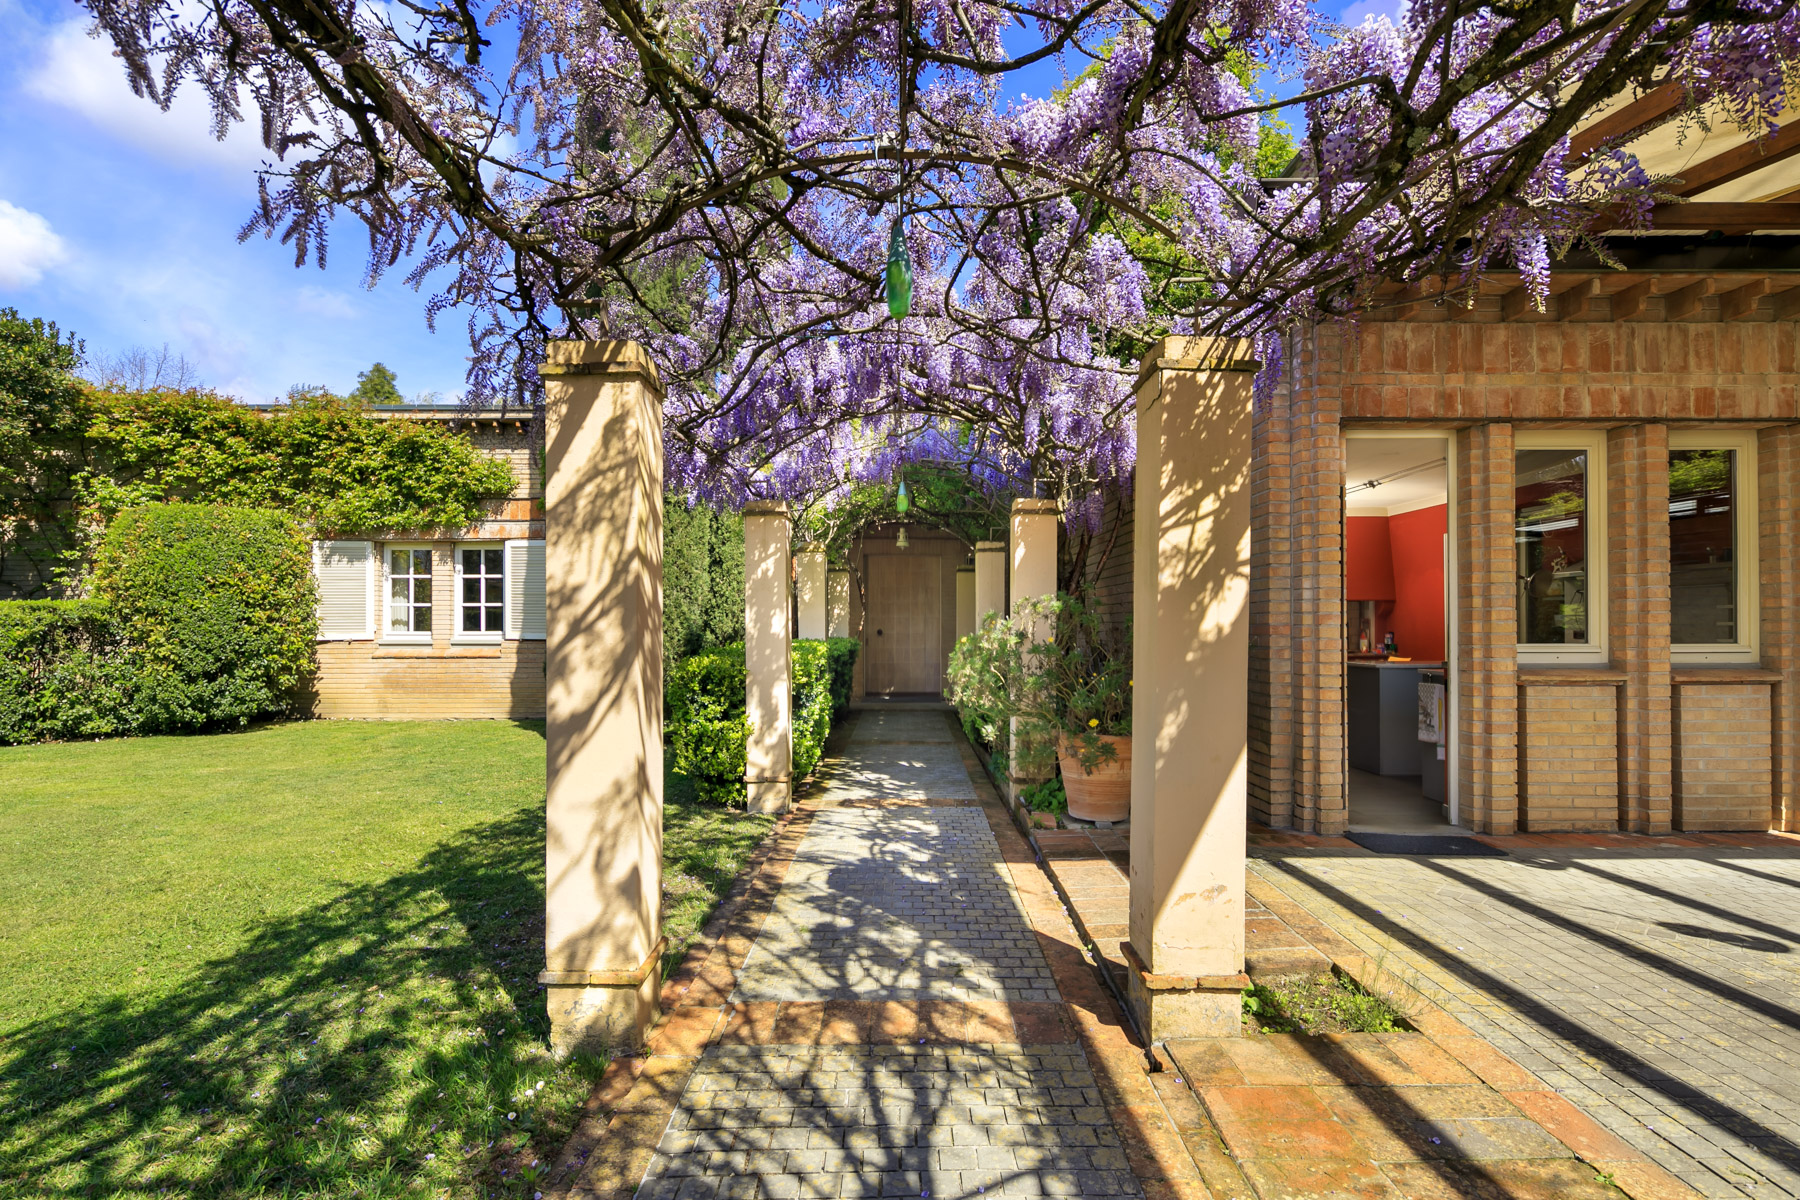 Villa in Vendita a Lucca: 5 locali, 500 mq - Foto 3